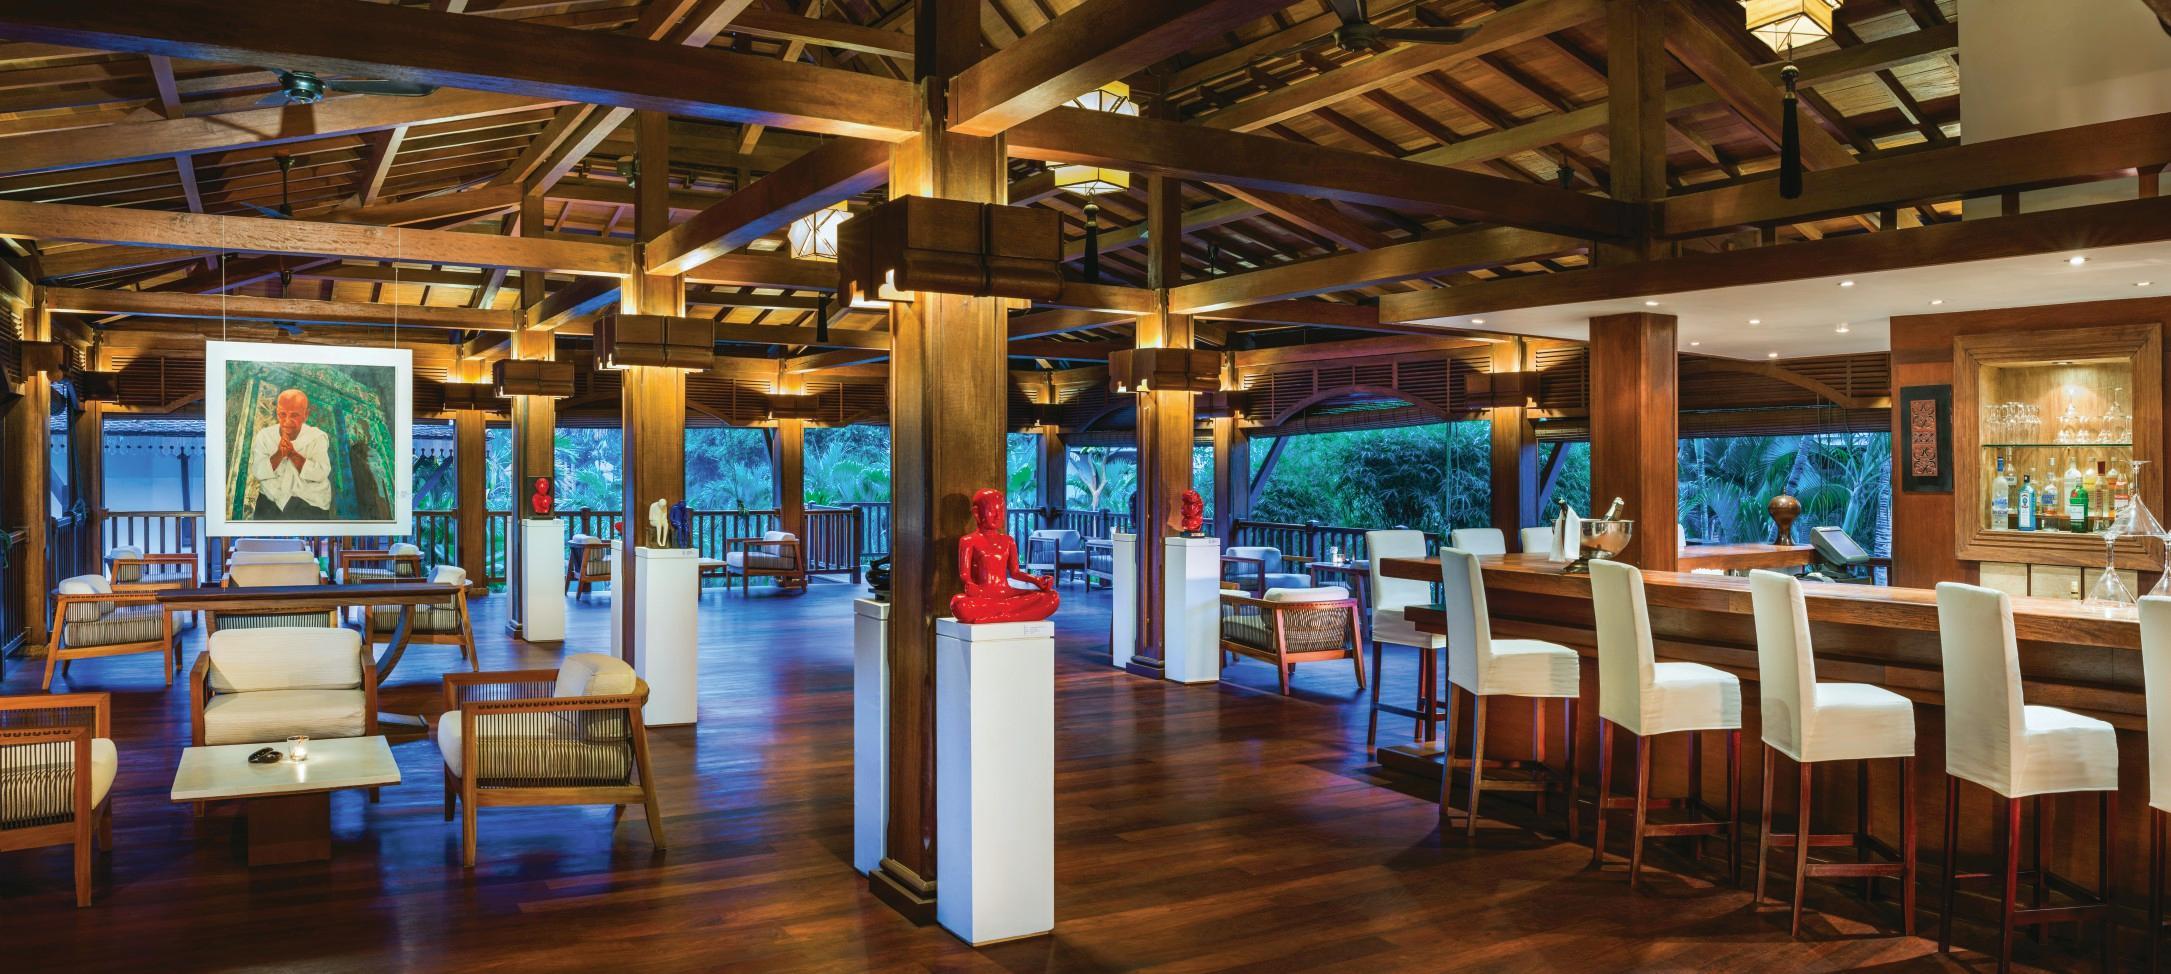 angkor restaurant orleans